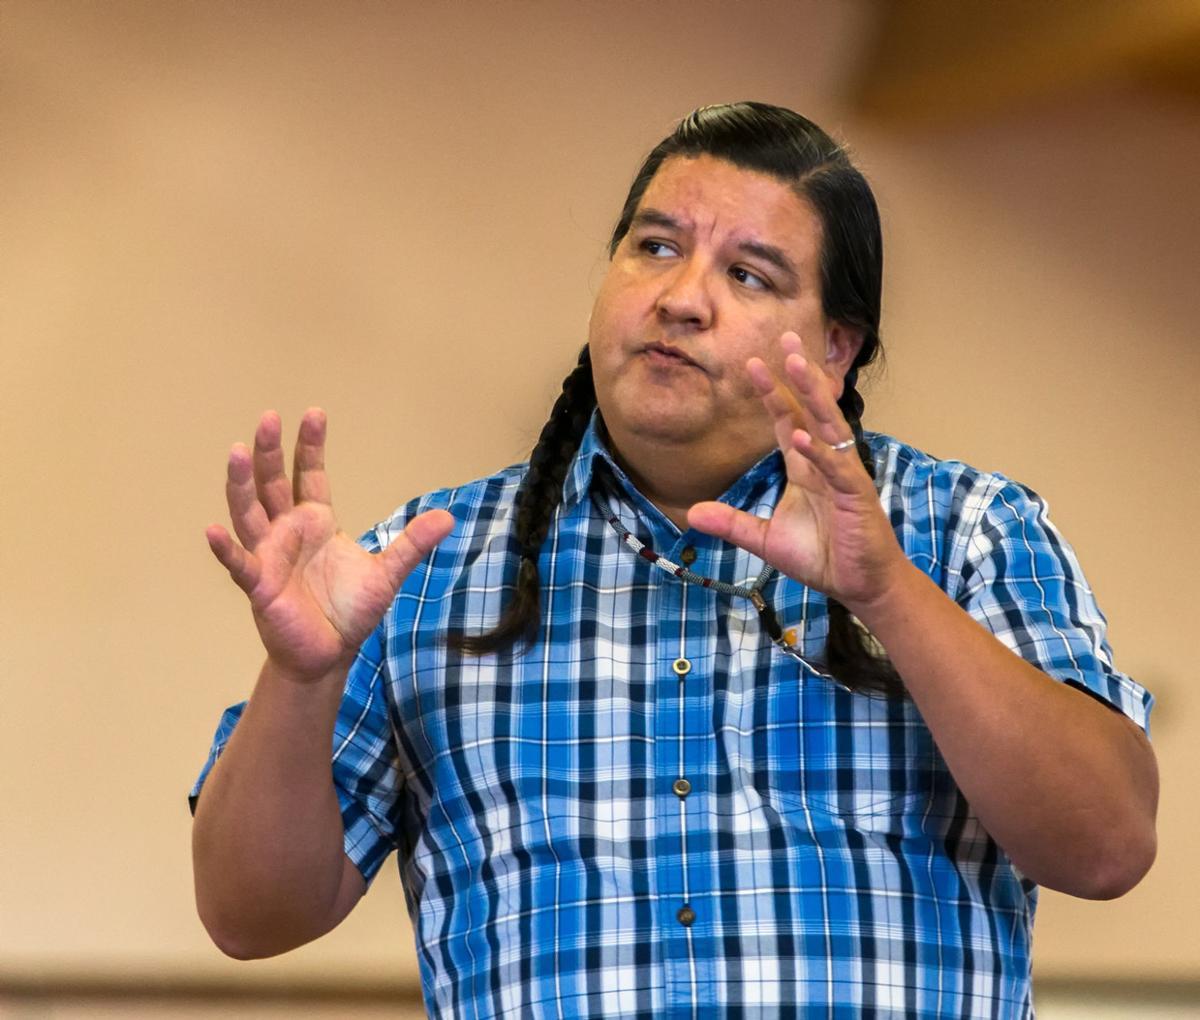 Area high schools get glimpse of tribal ways